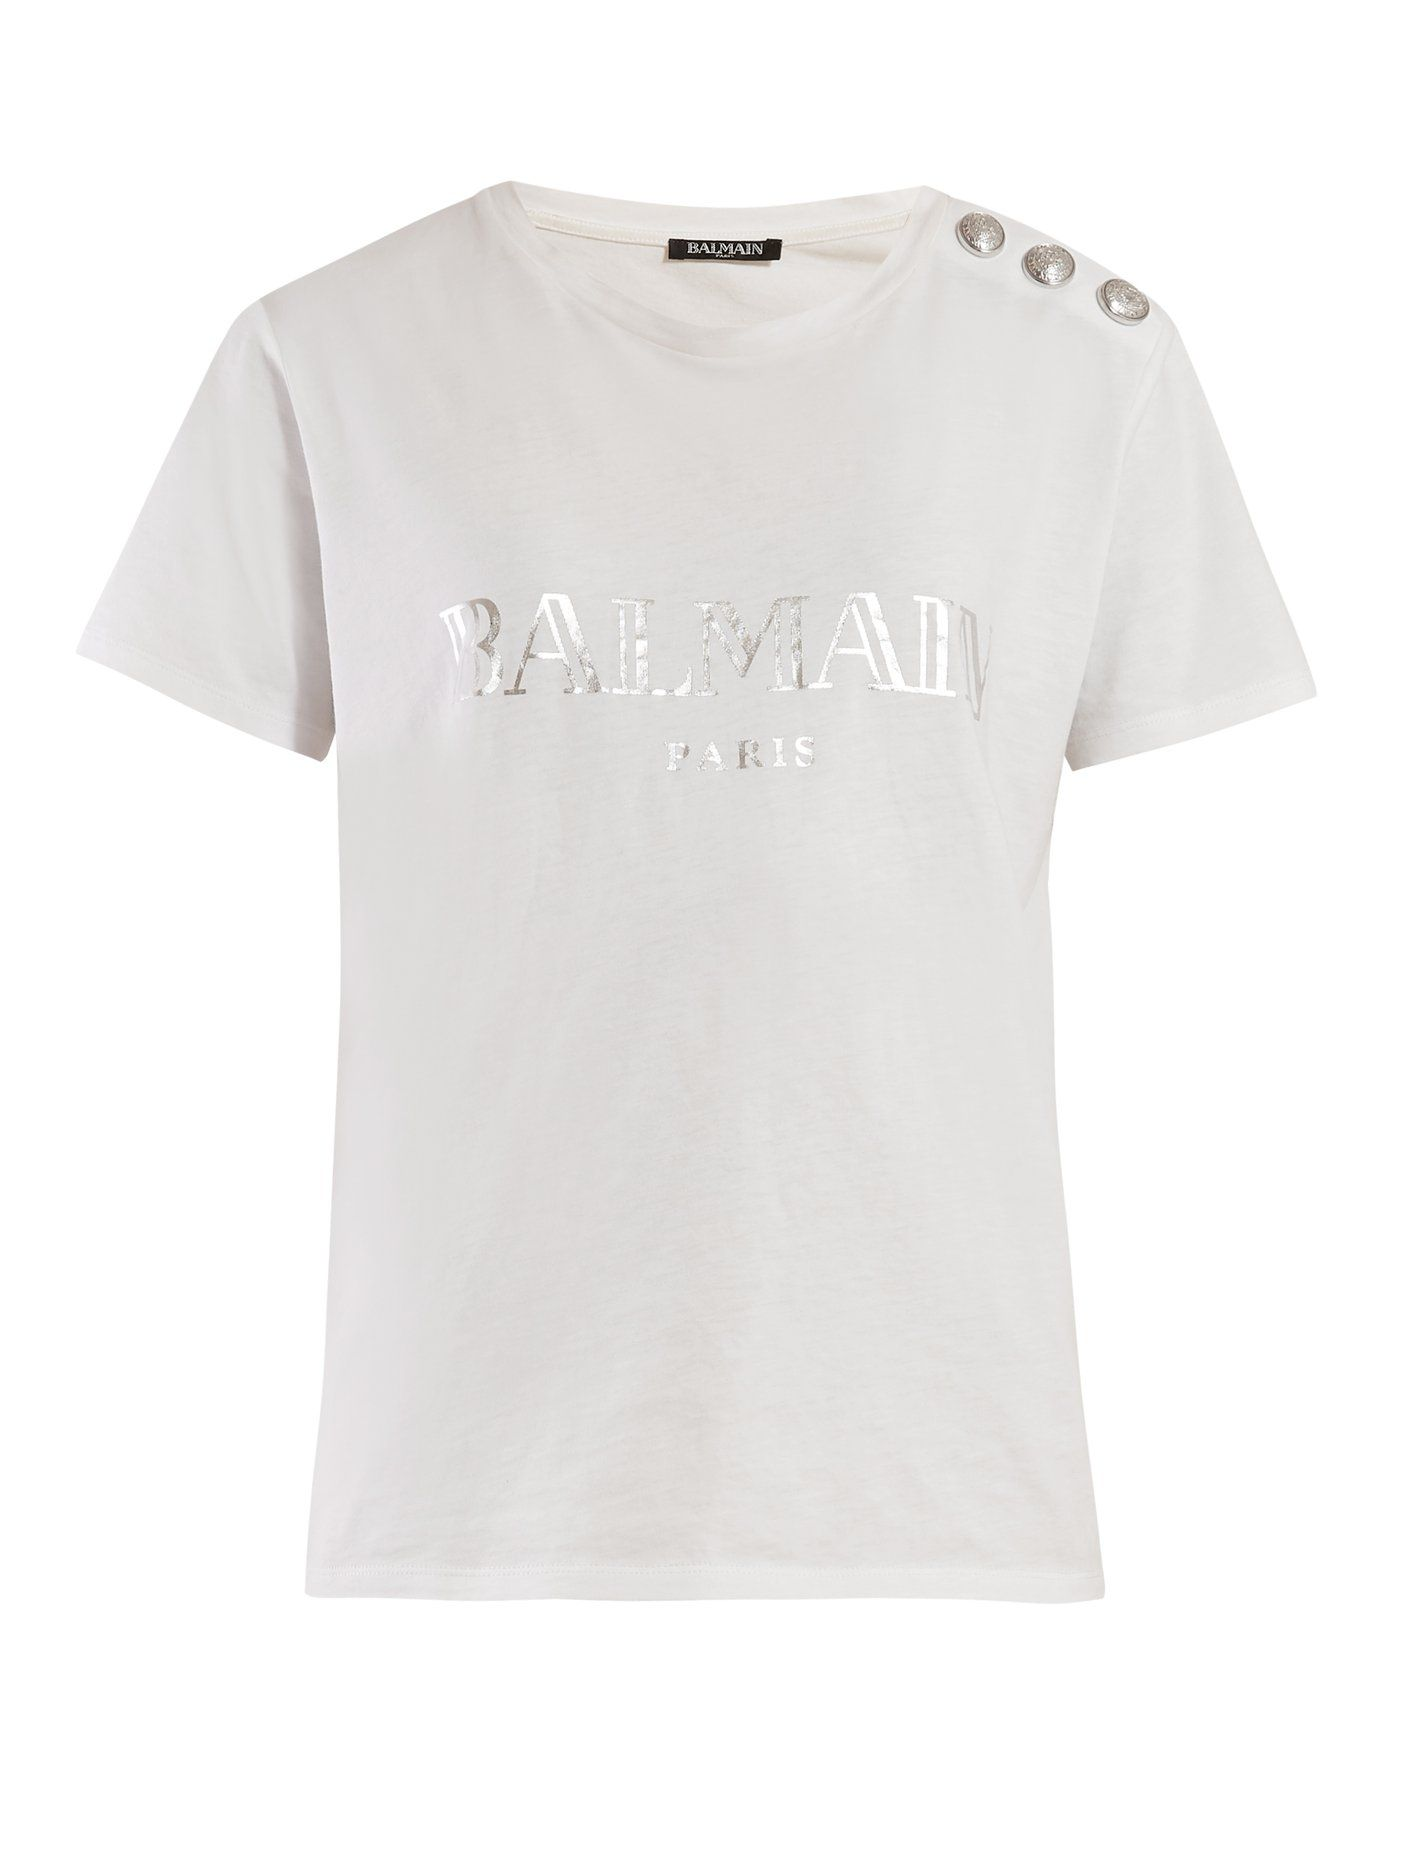 90ffac2236235f Logo-print cotton T-shirt | Balmain | MATCHESFASHION.COM US | TOPS ...